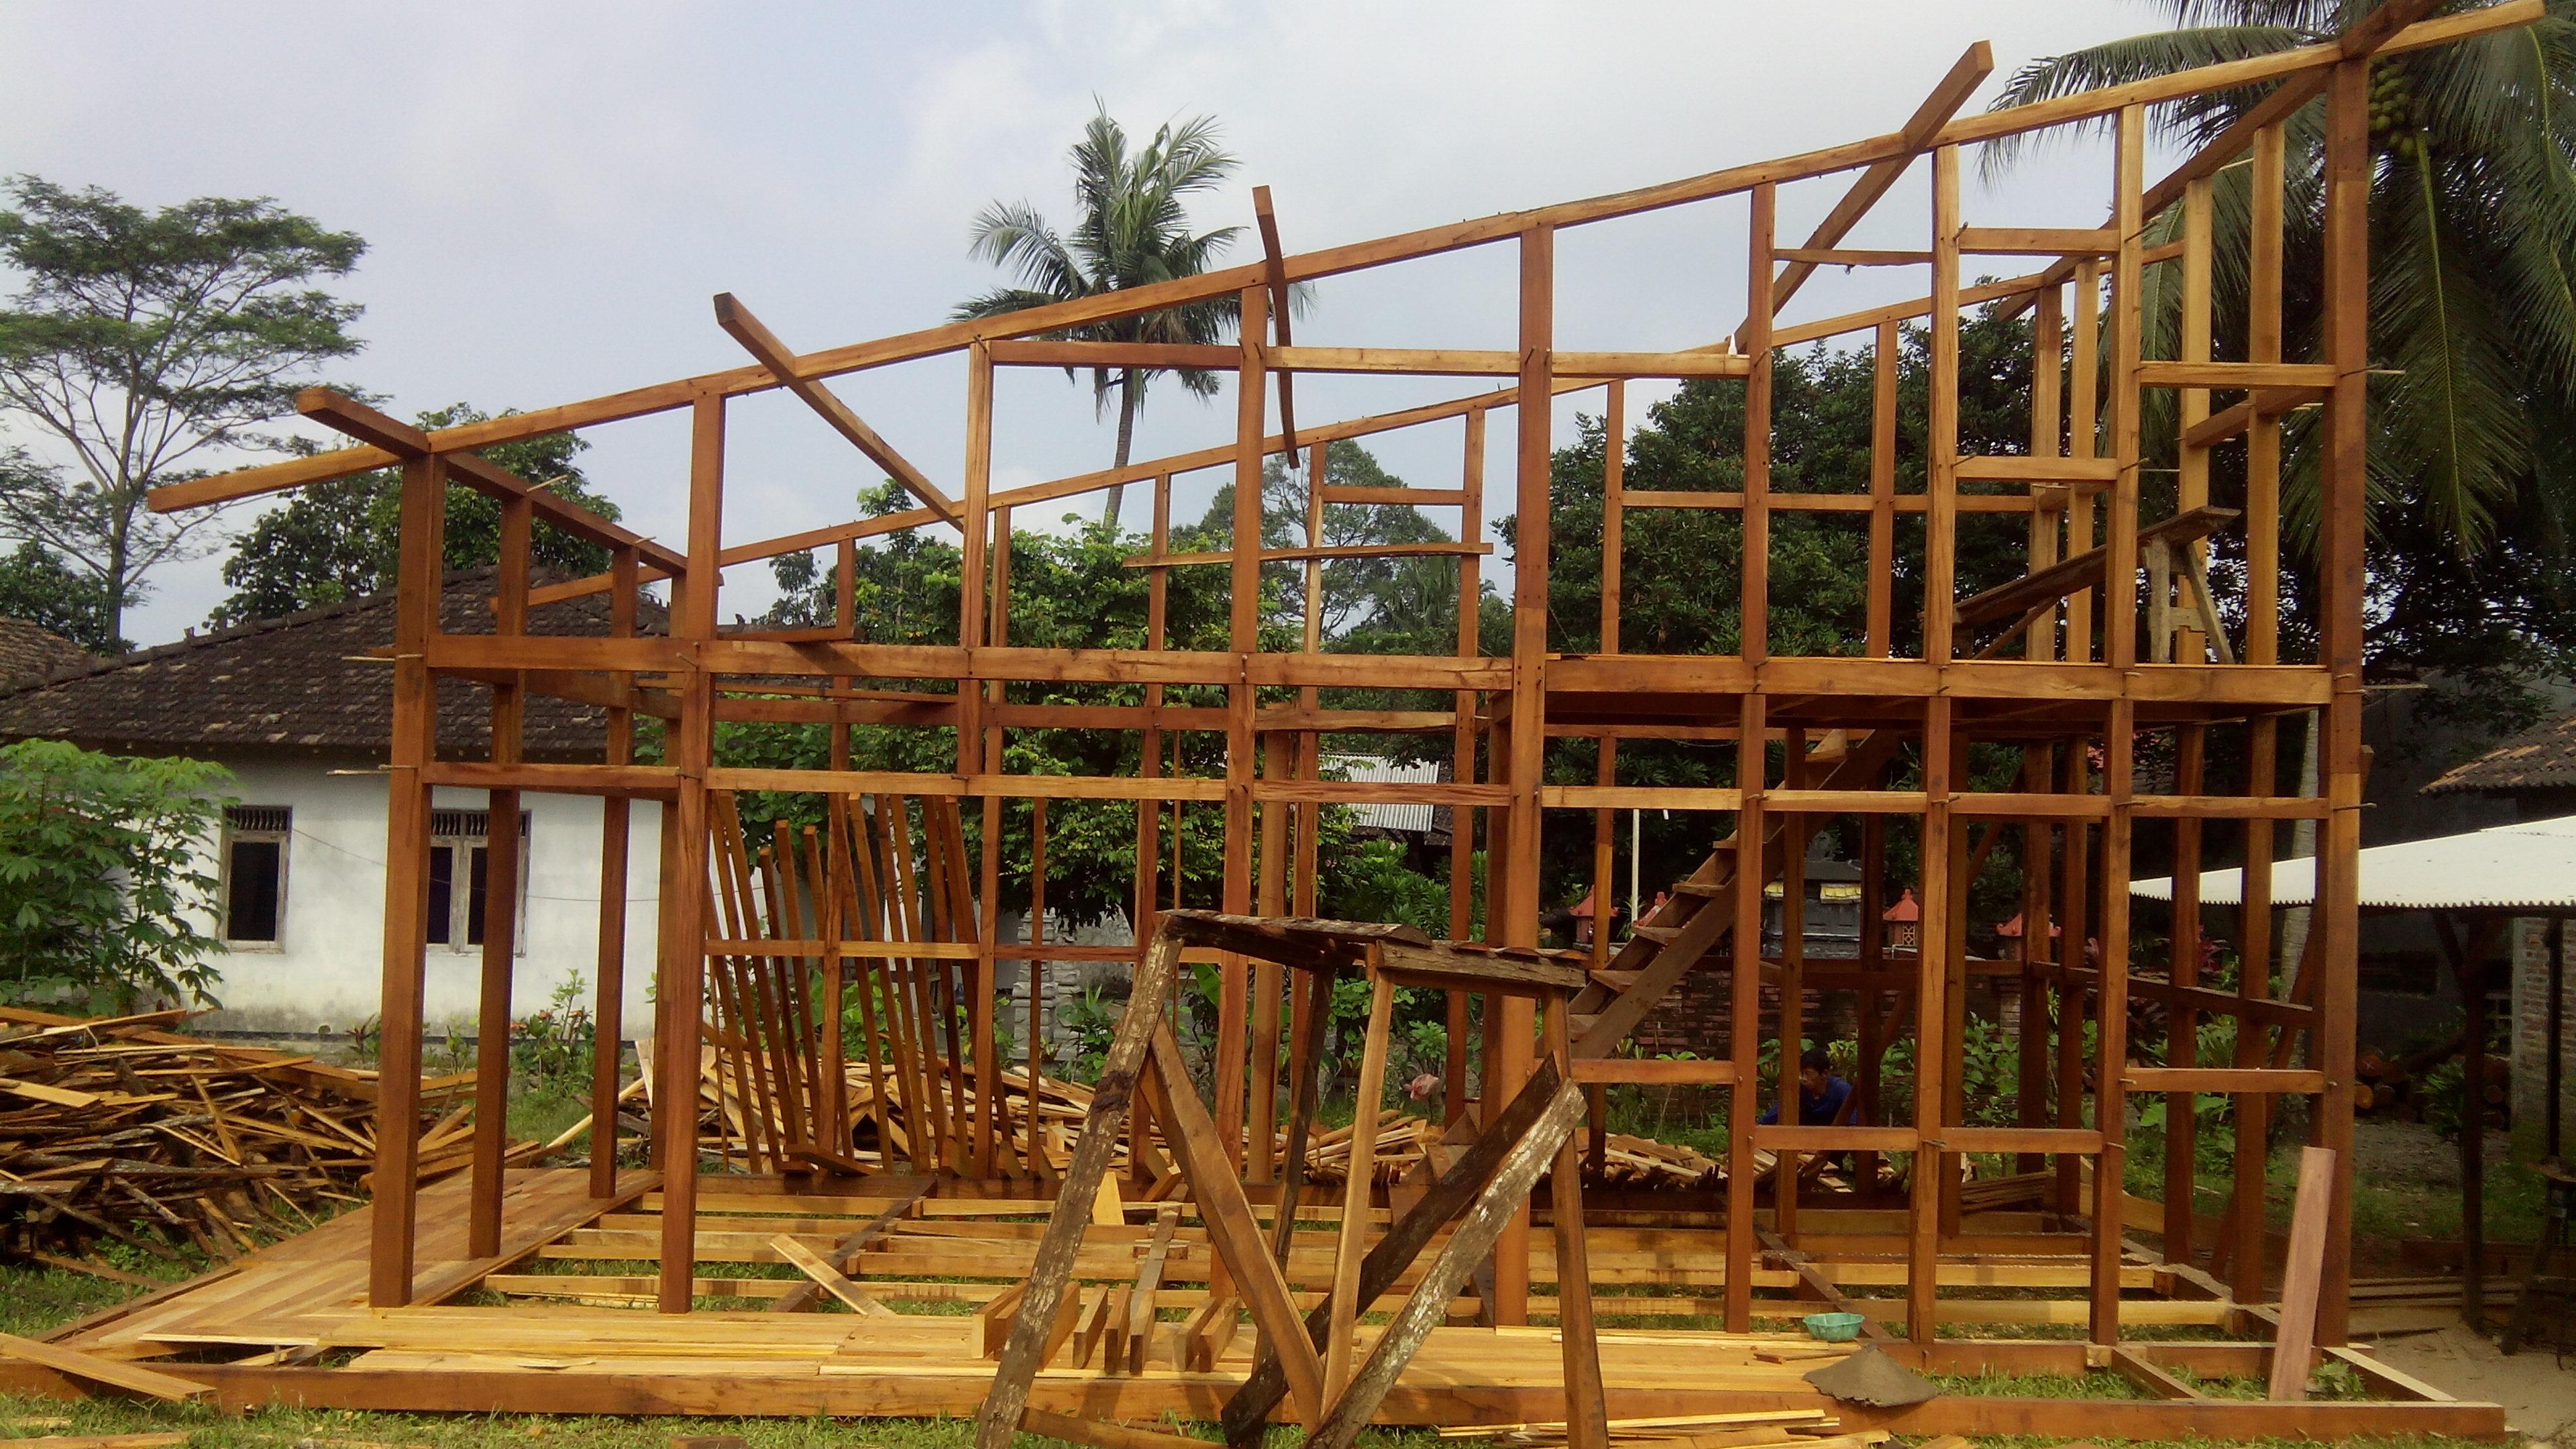 jual rumah kayu di jakarta bogor bandung depok tangerang